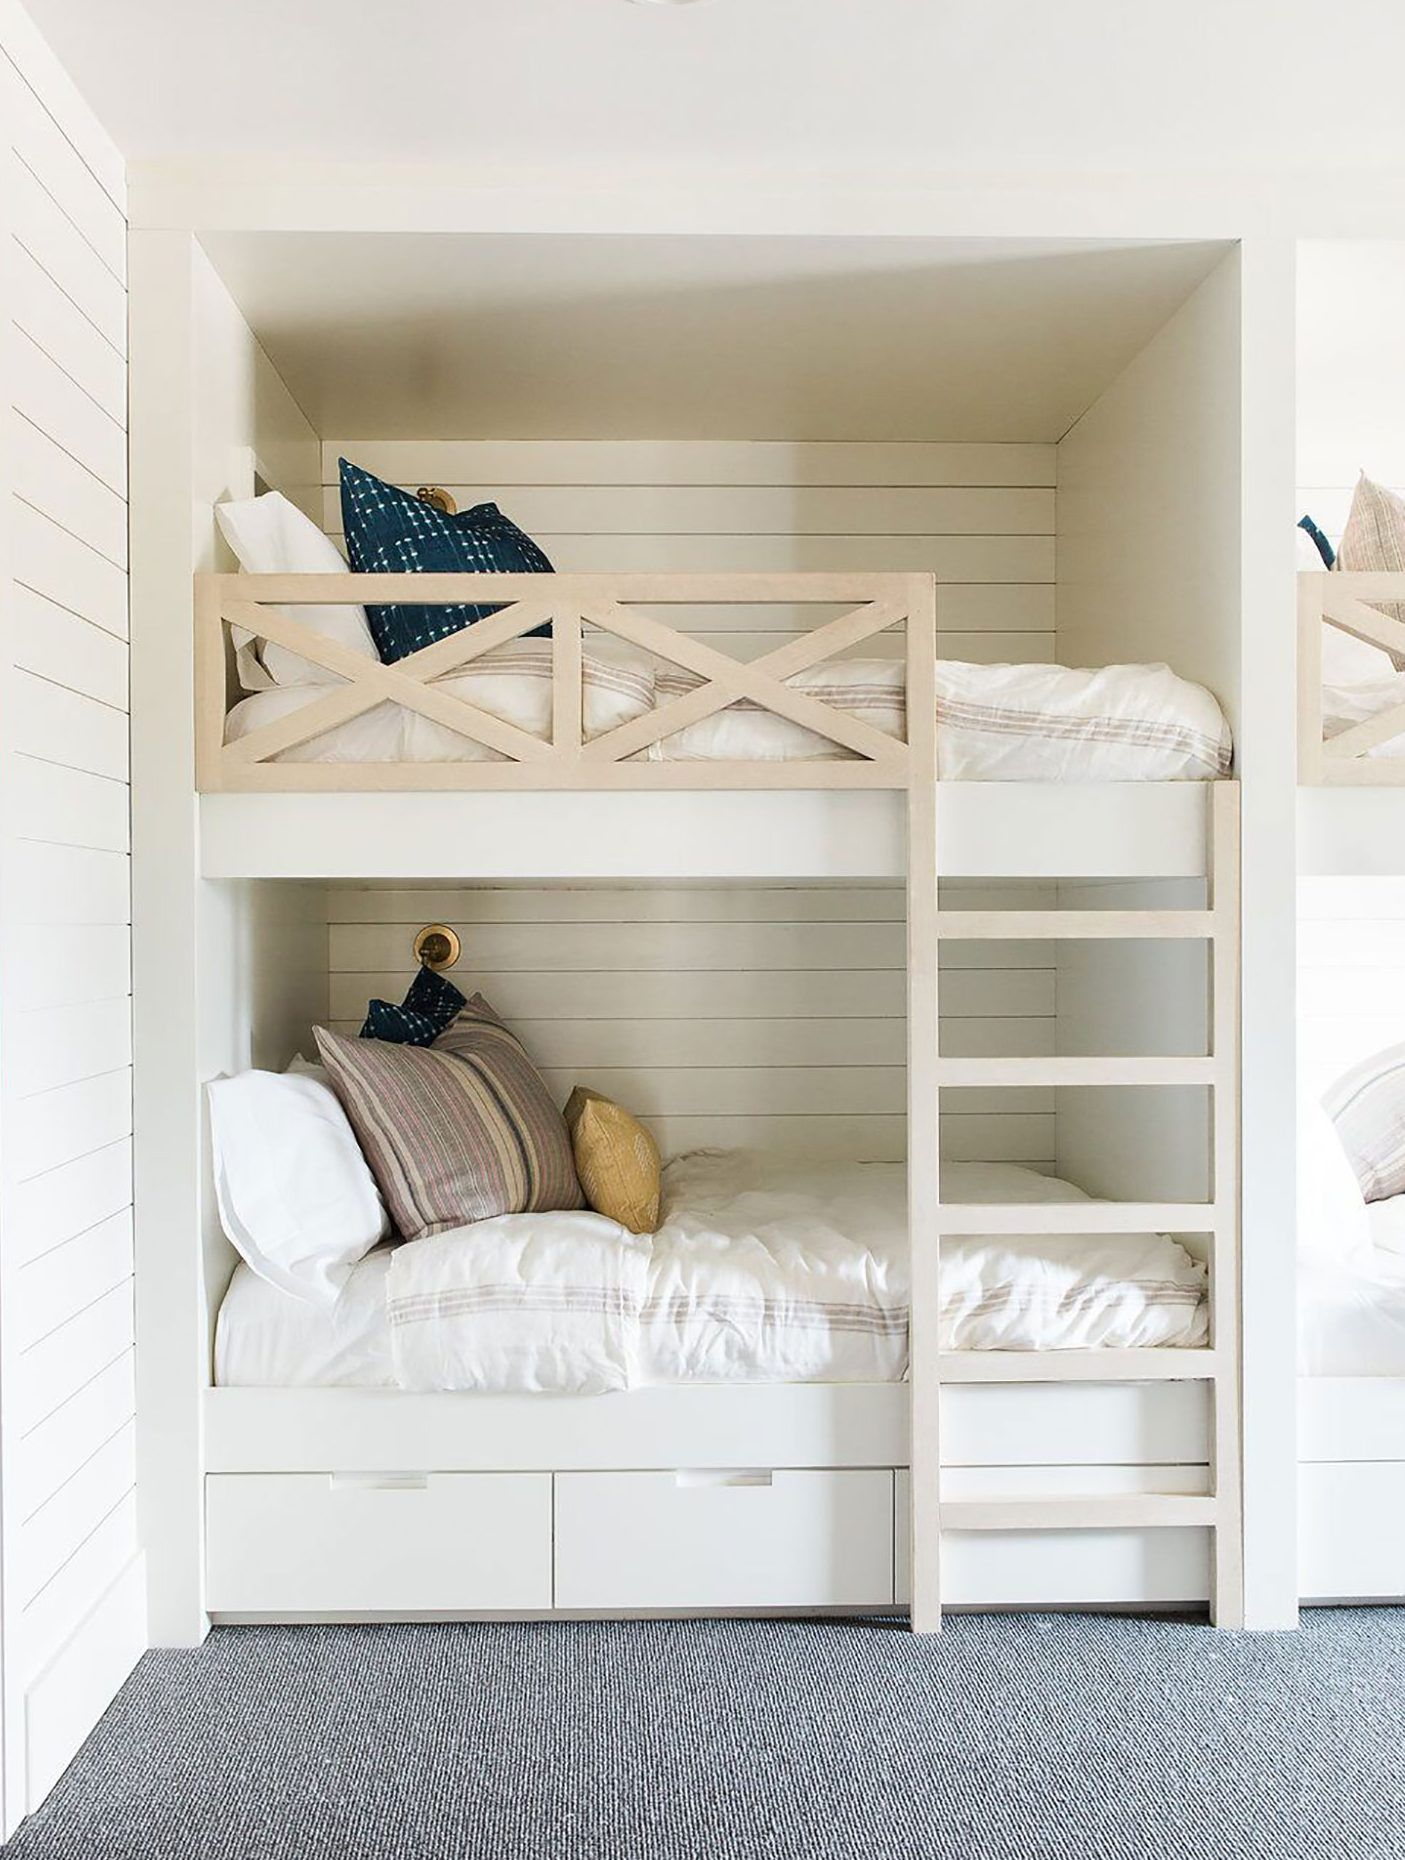 How To Make Diy Built In Bunk Beds Diy Bunk Bed Cool Bunk Beds